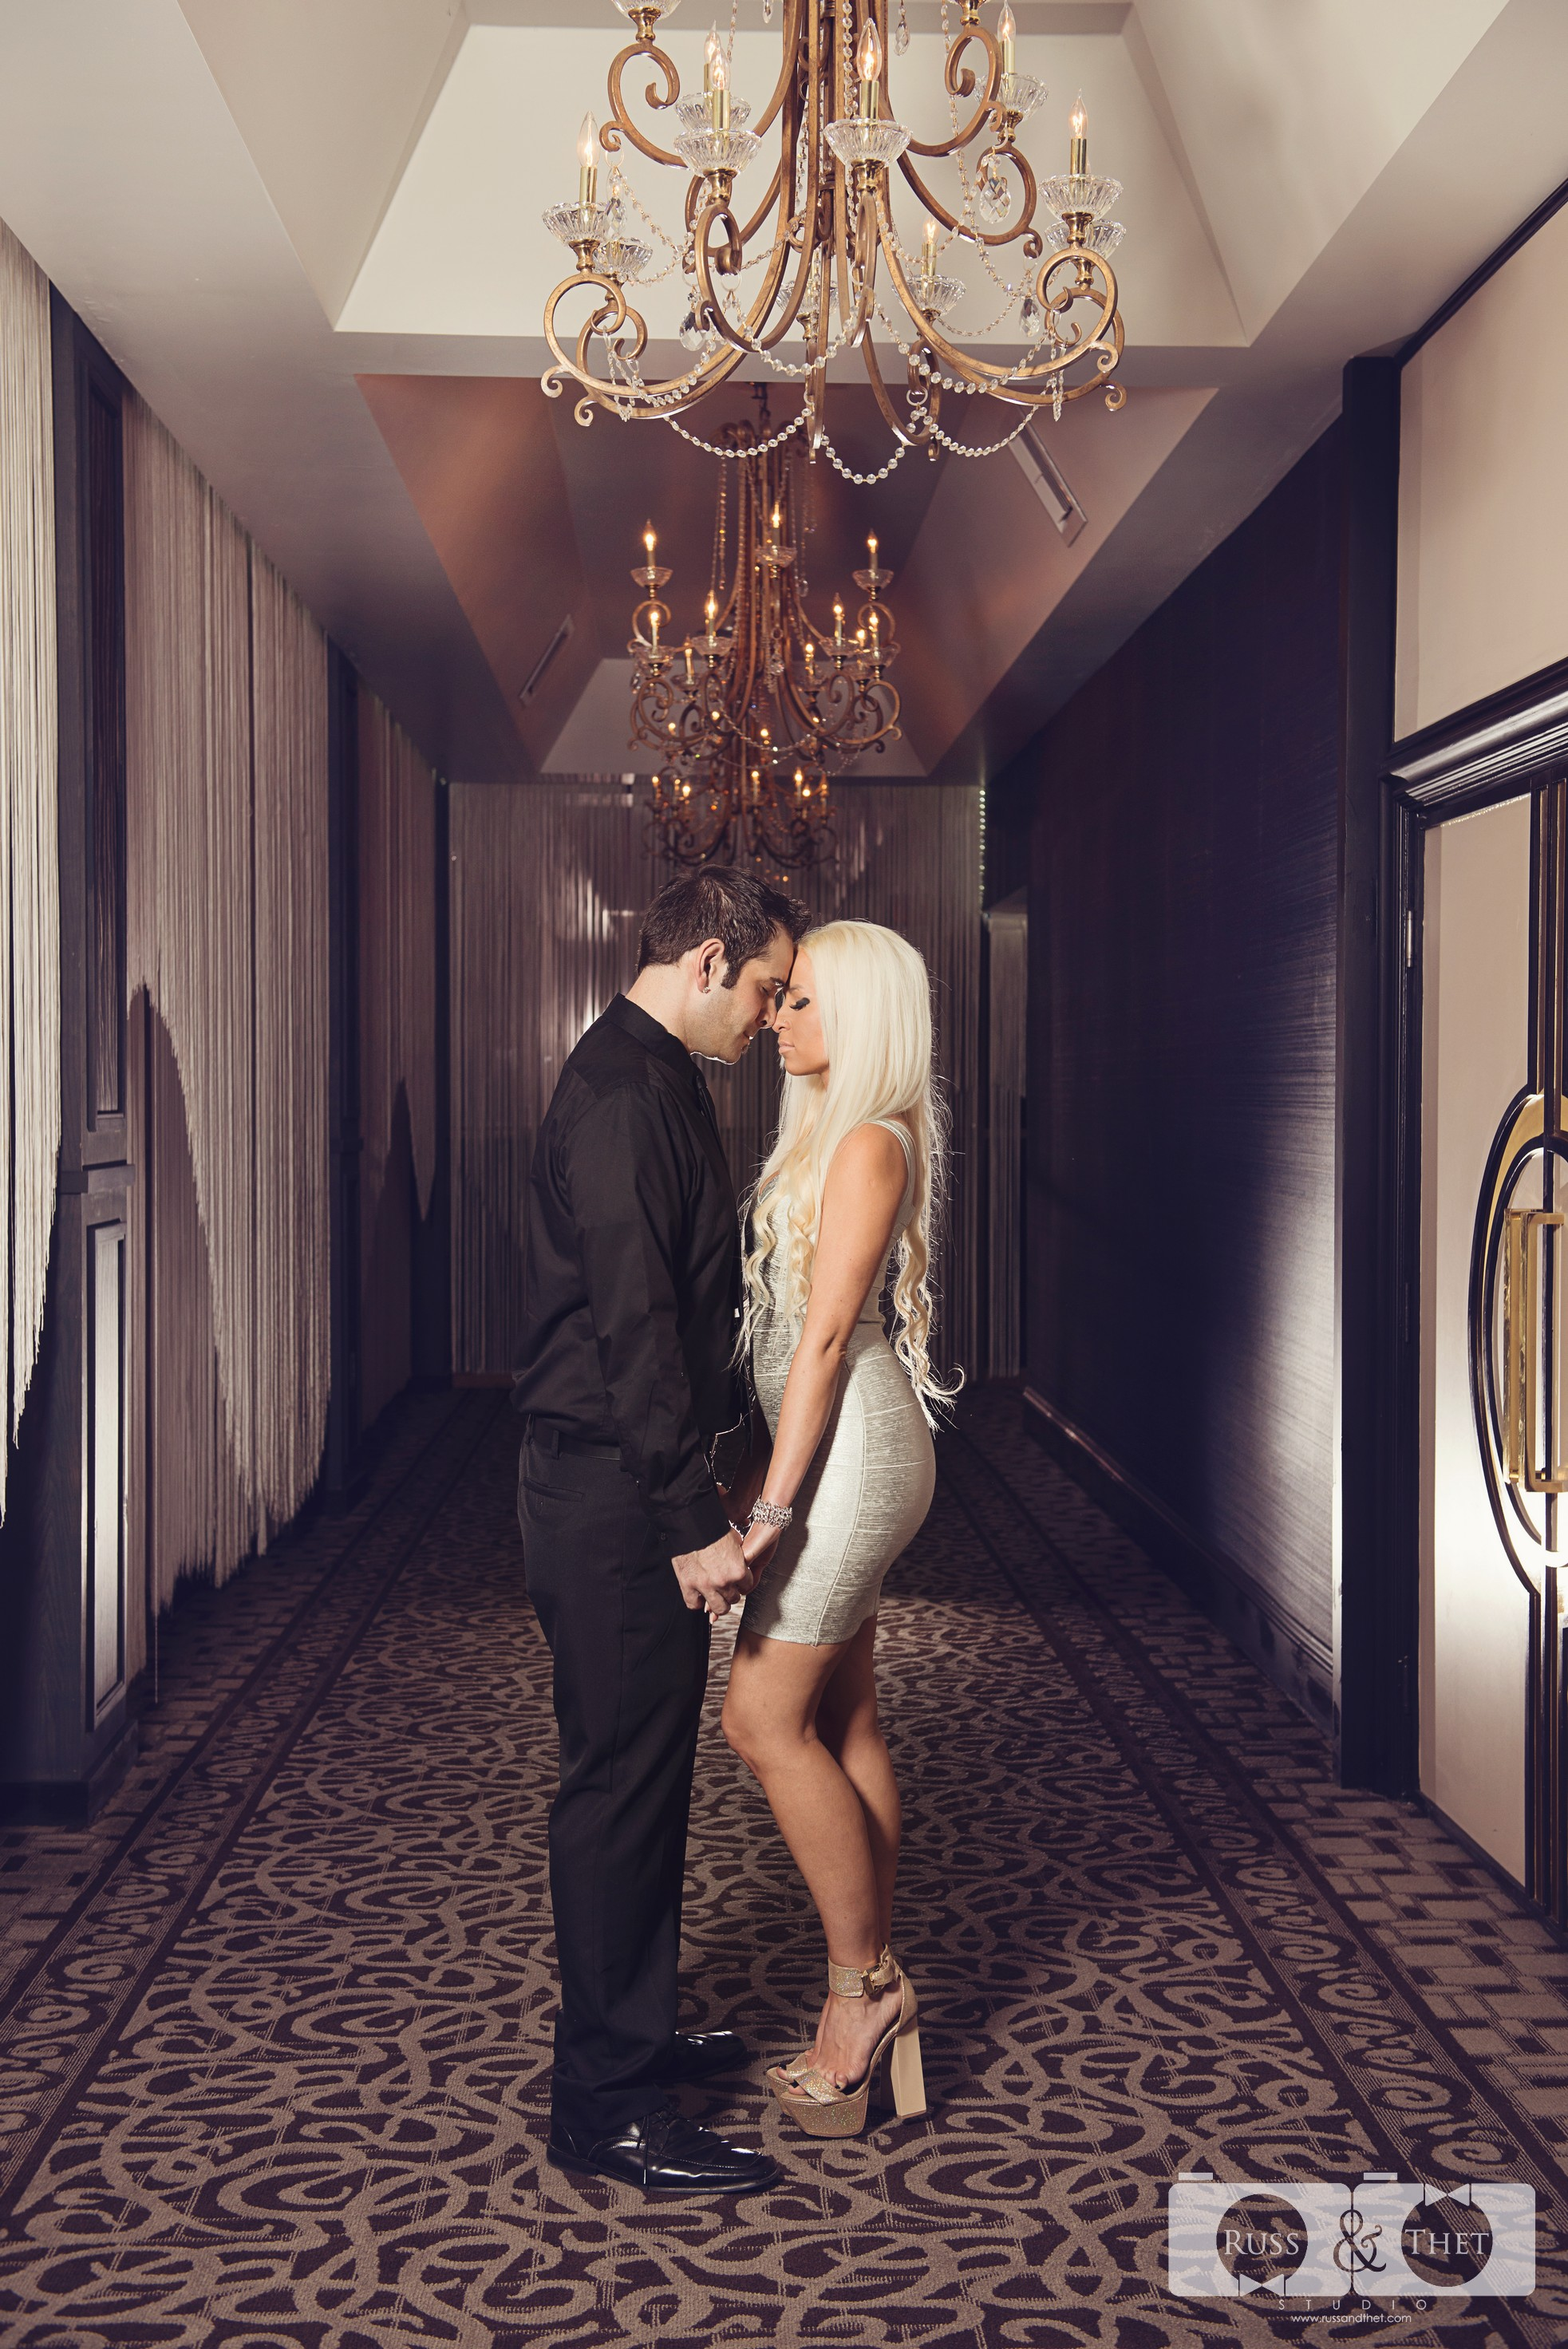 Jon&Kimee-The-Hills-Hotel-Engagement-Photographer (42).jpg